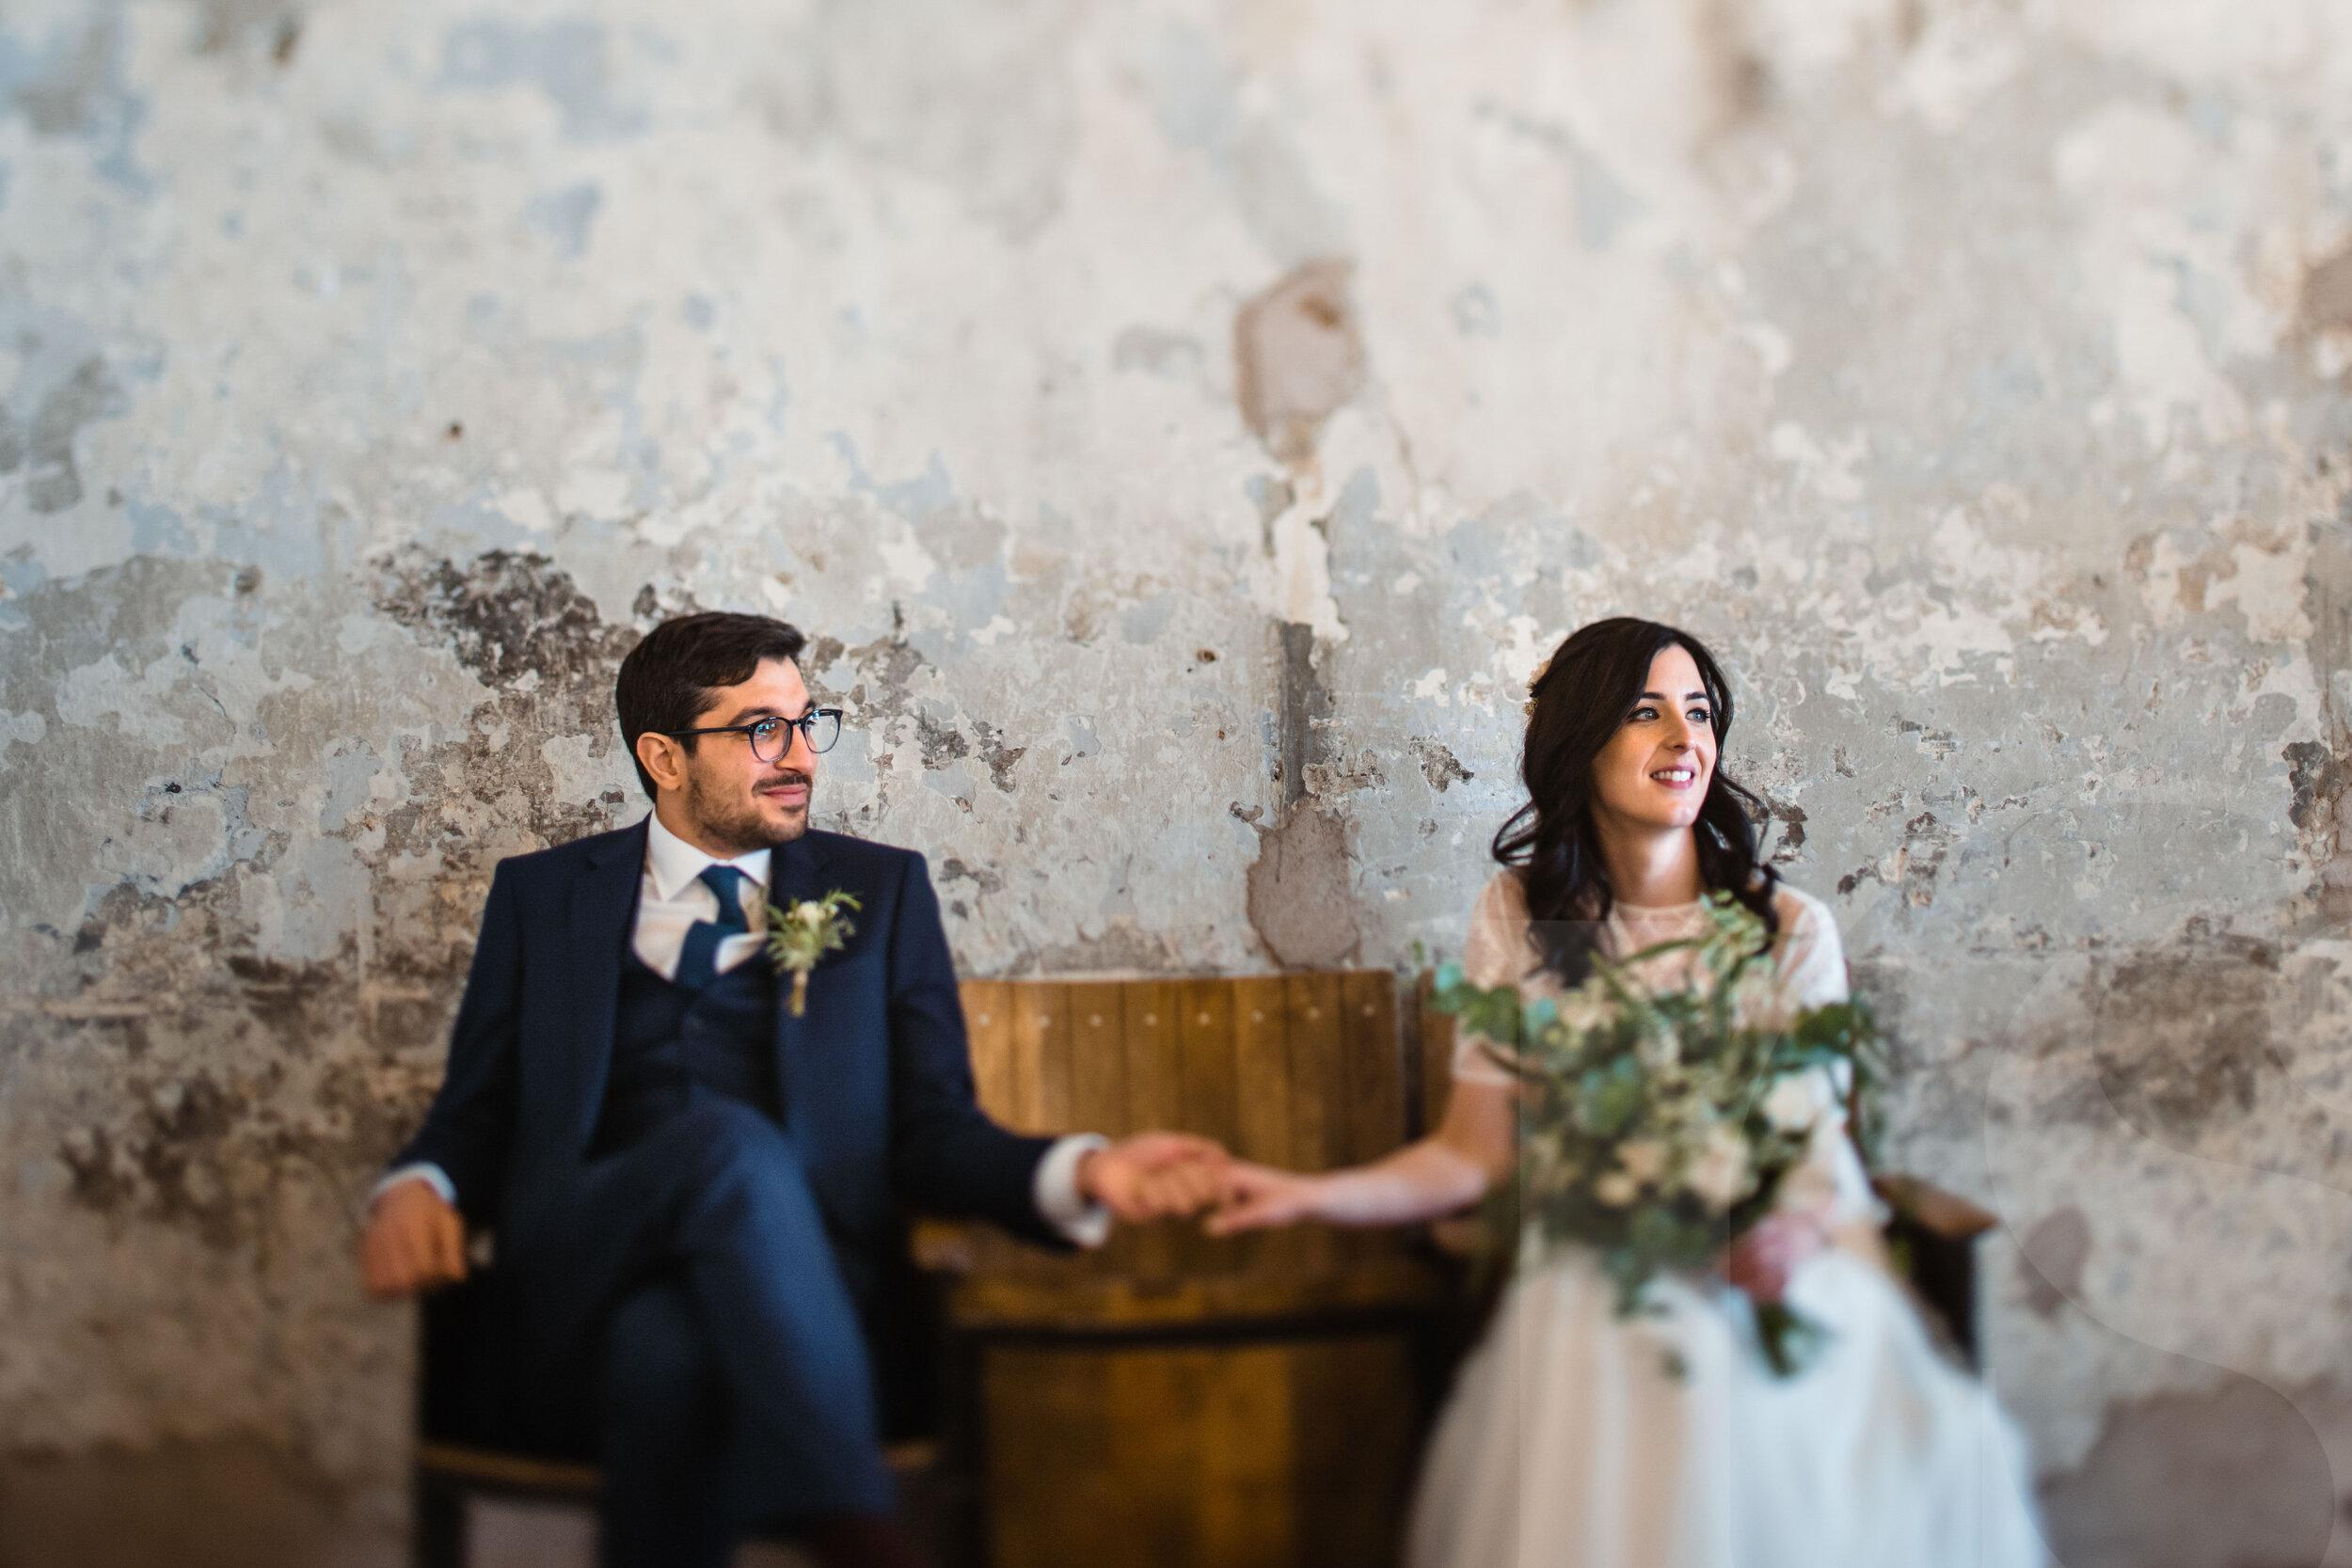 holmes-mill-clitheroe-wedding-photography-2.jpg